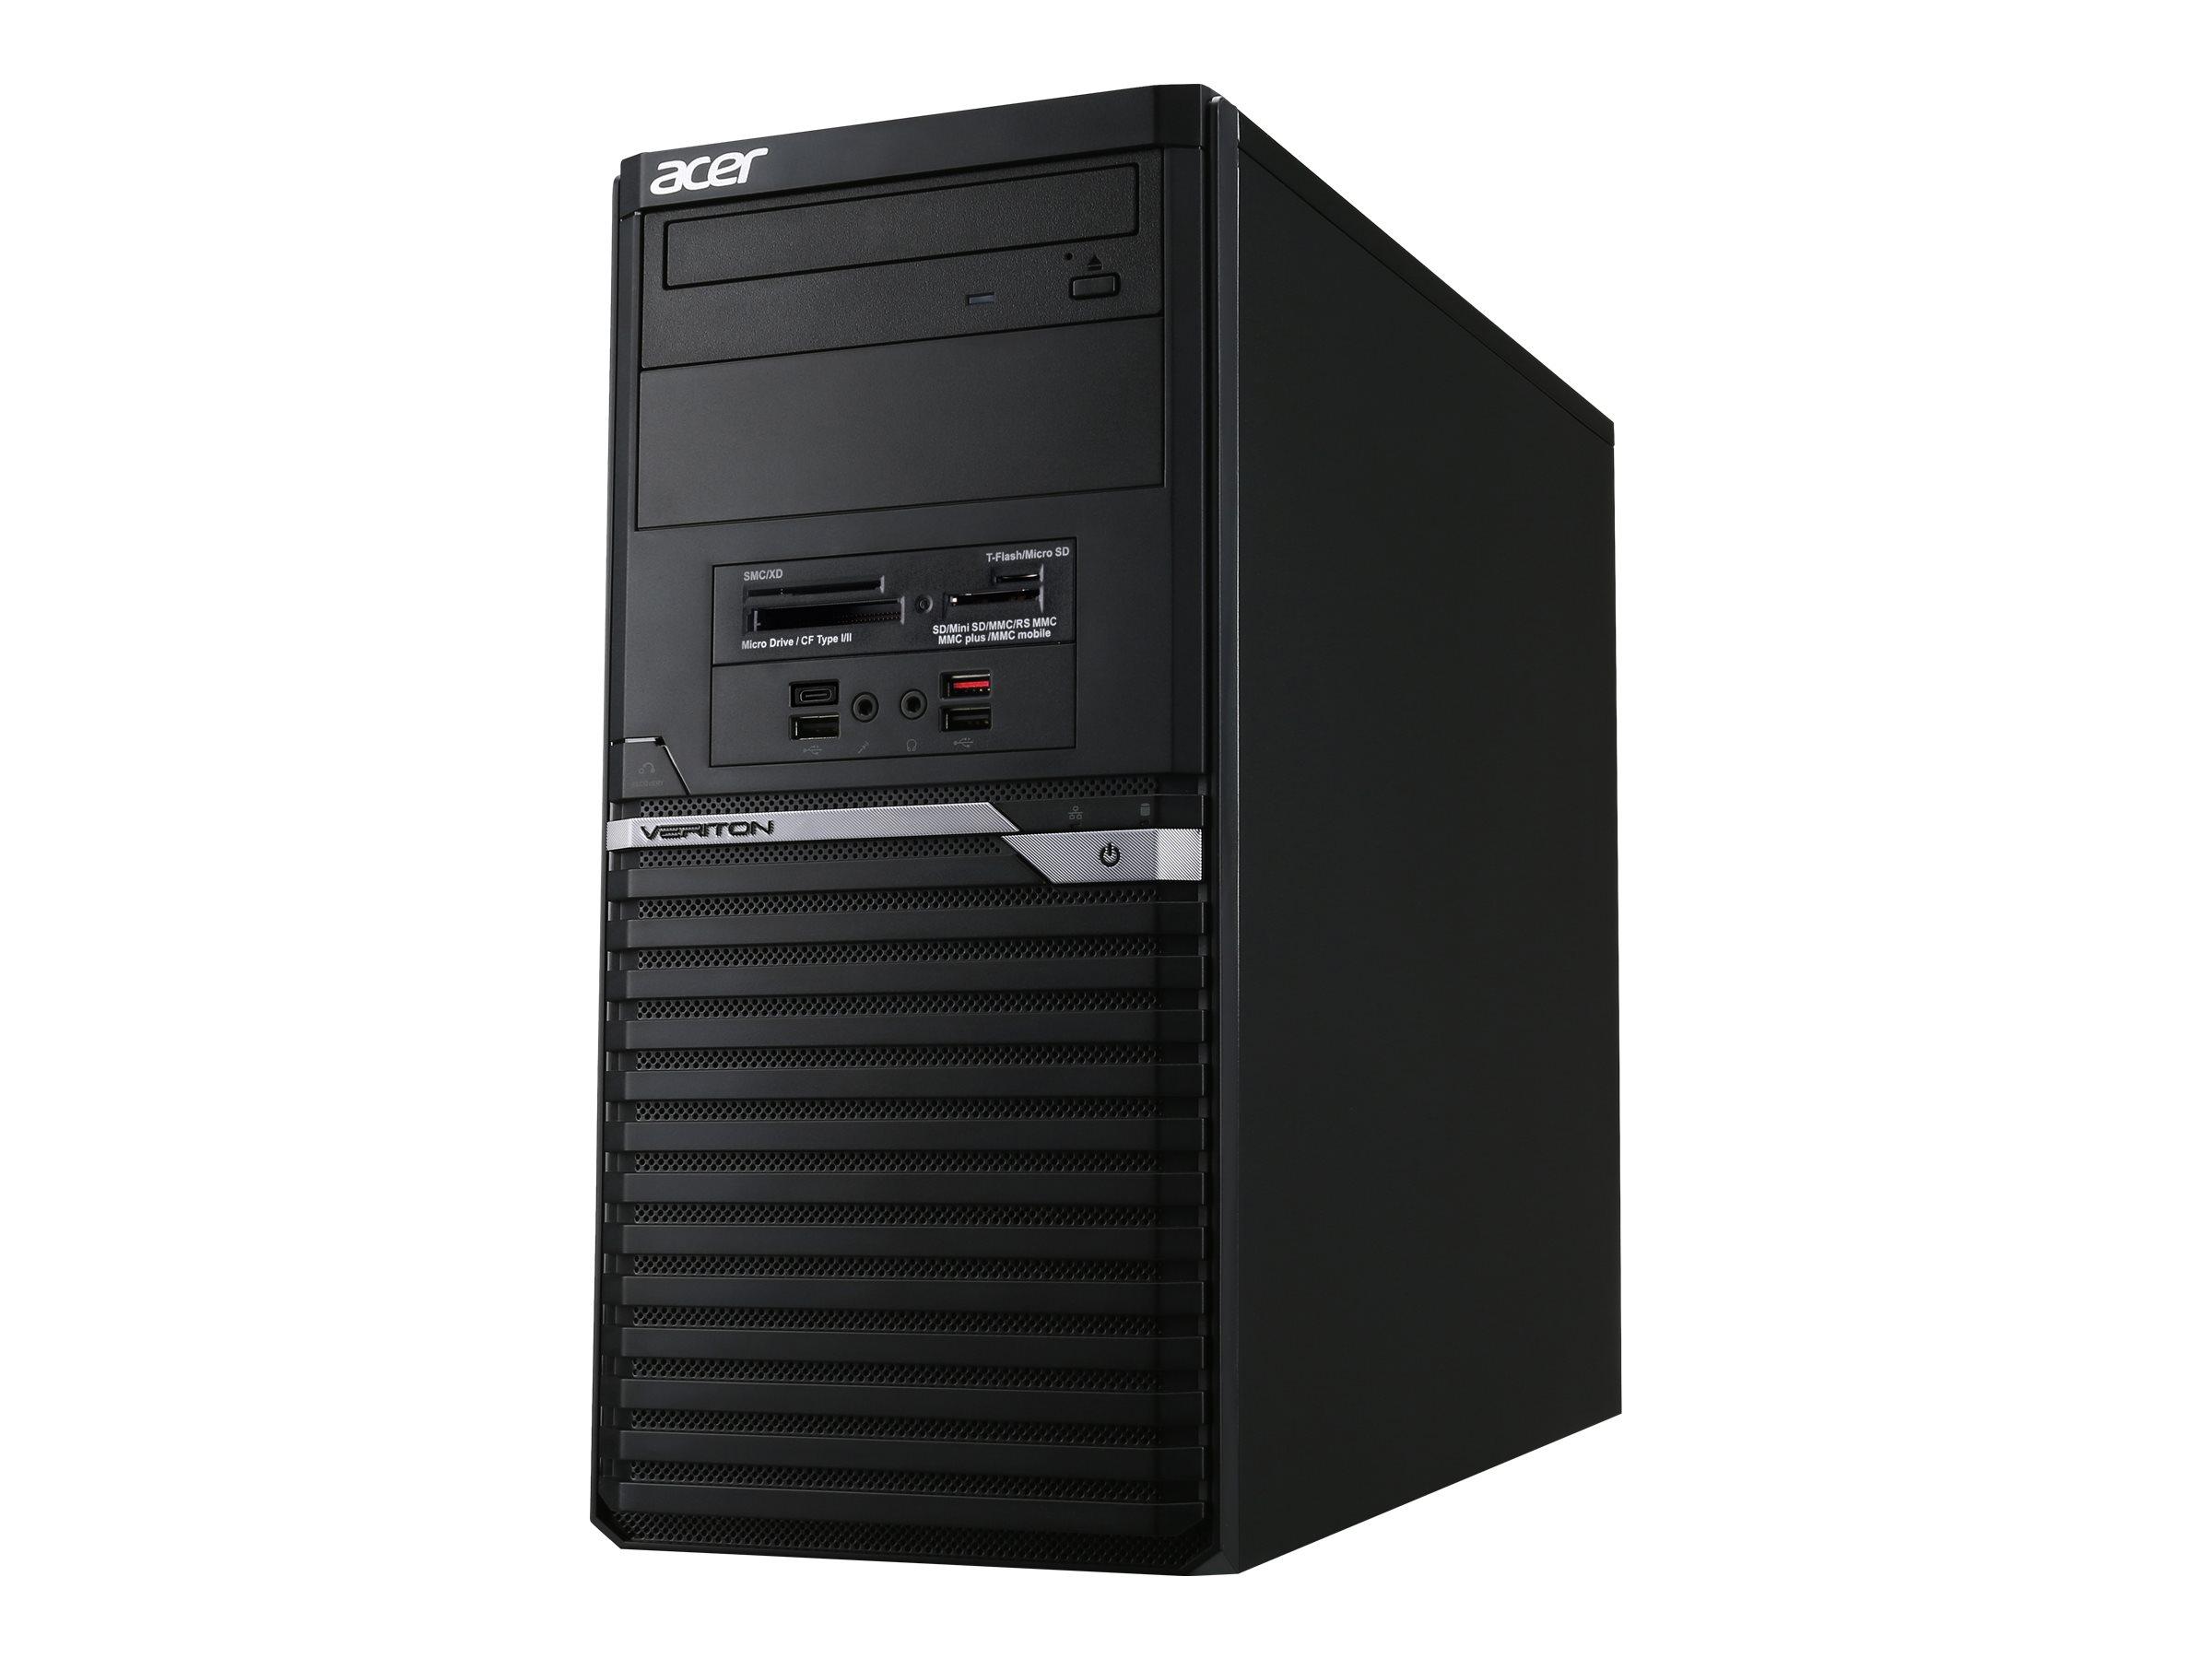 Acer Veriton M4 VM4660G-I3810H1 - MT - Core i3 8100 3.6 GHz - 4 GB - HDD 500 GB